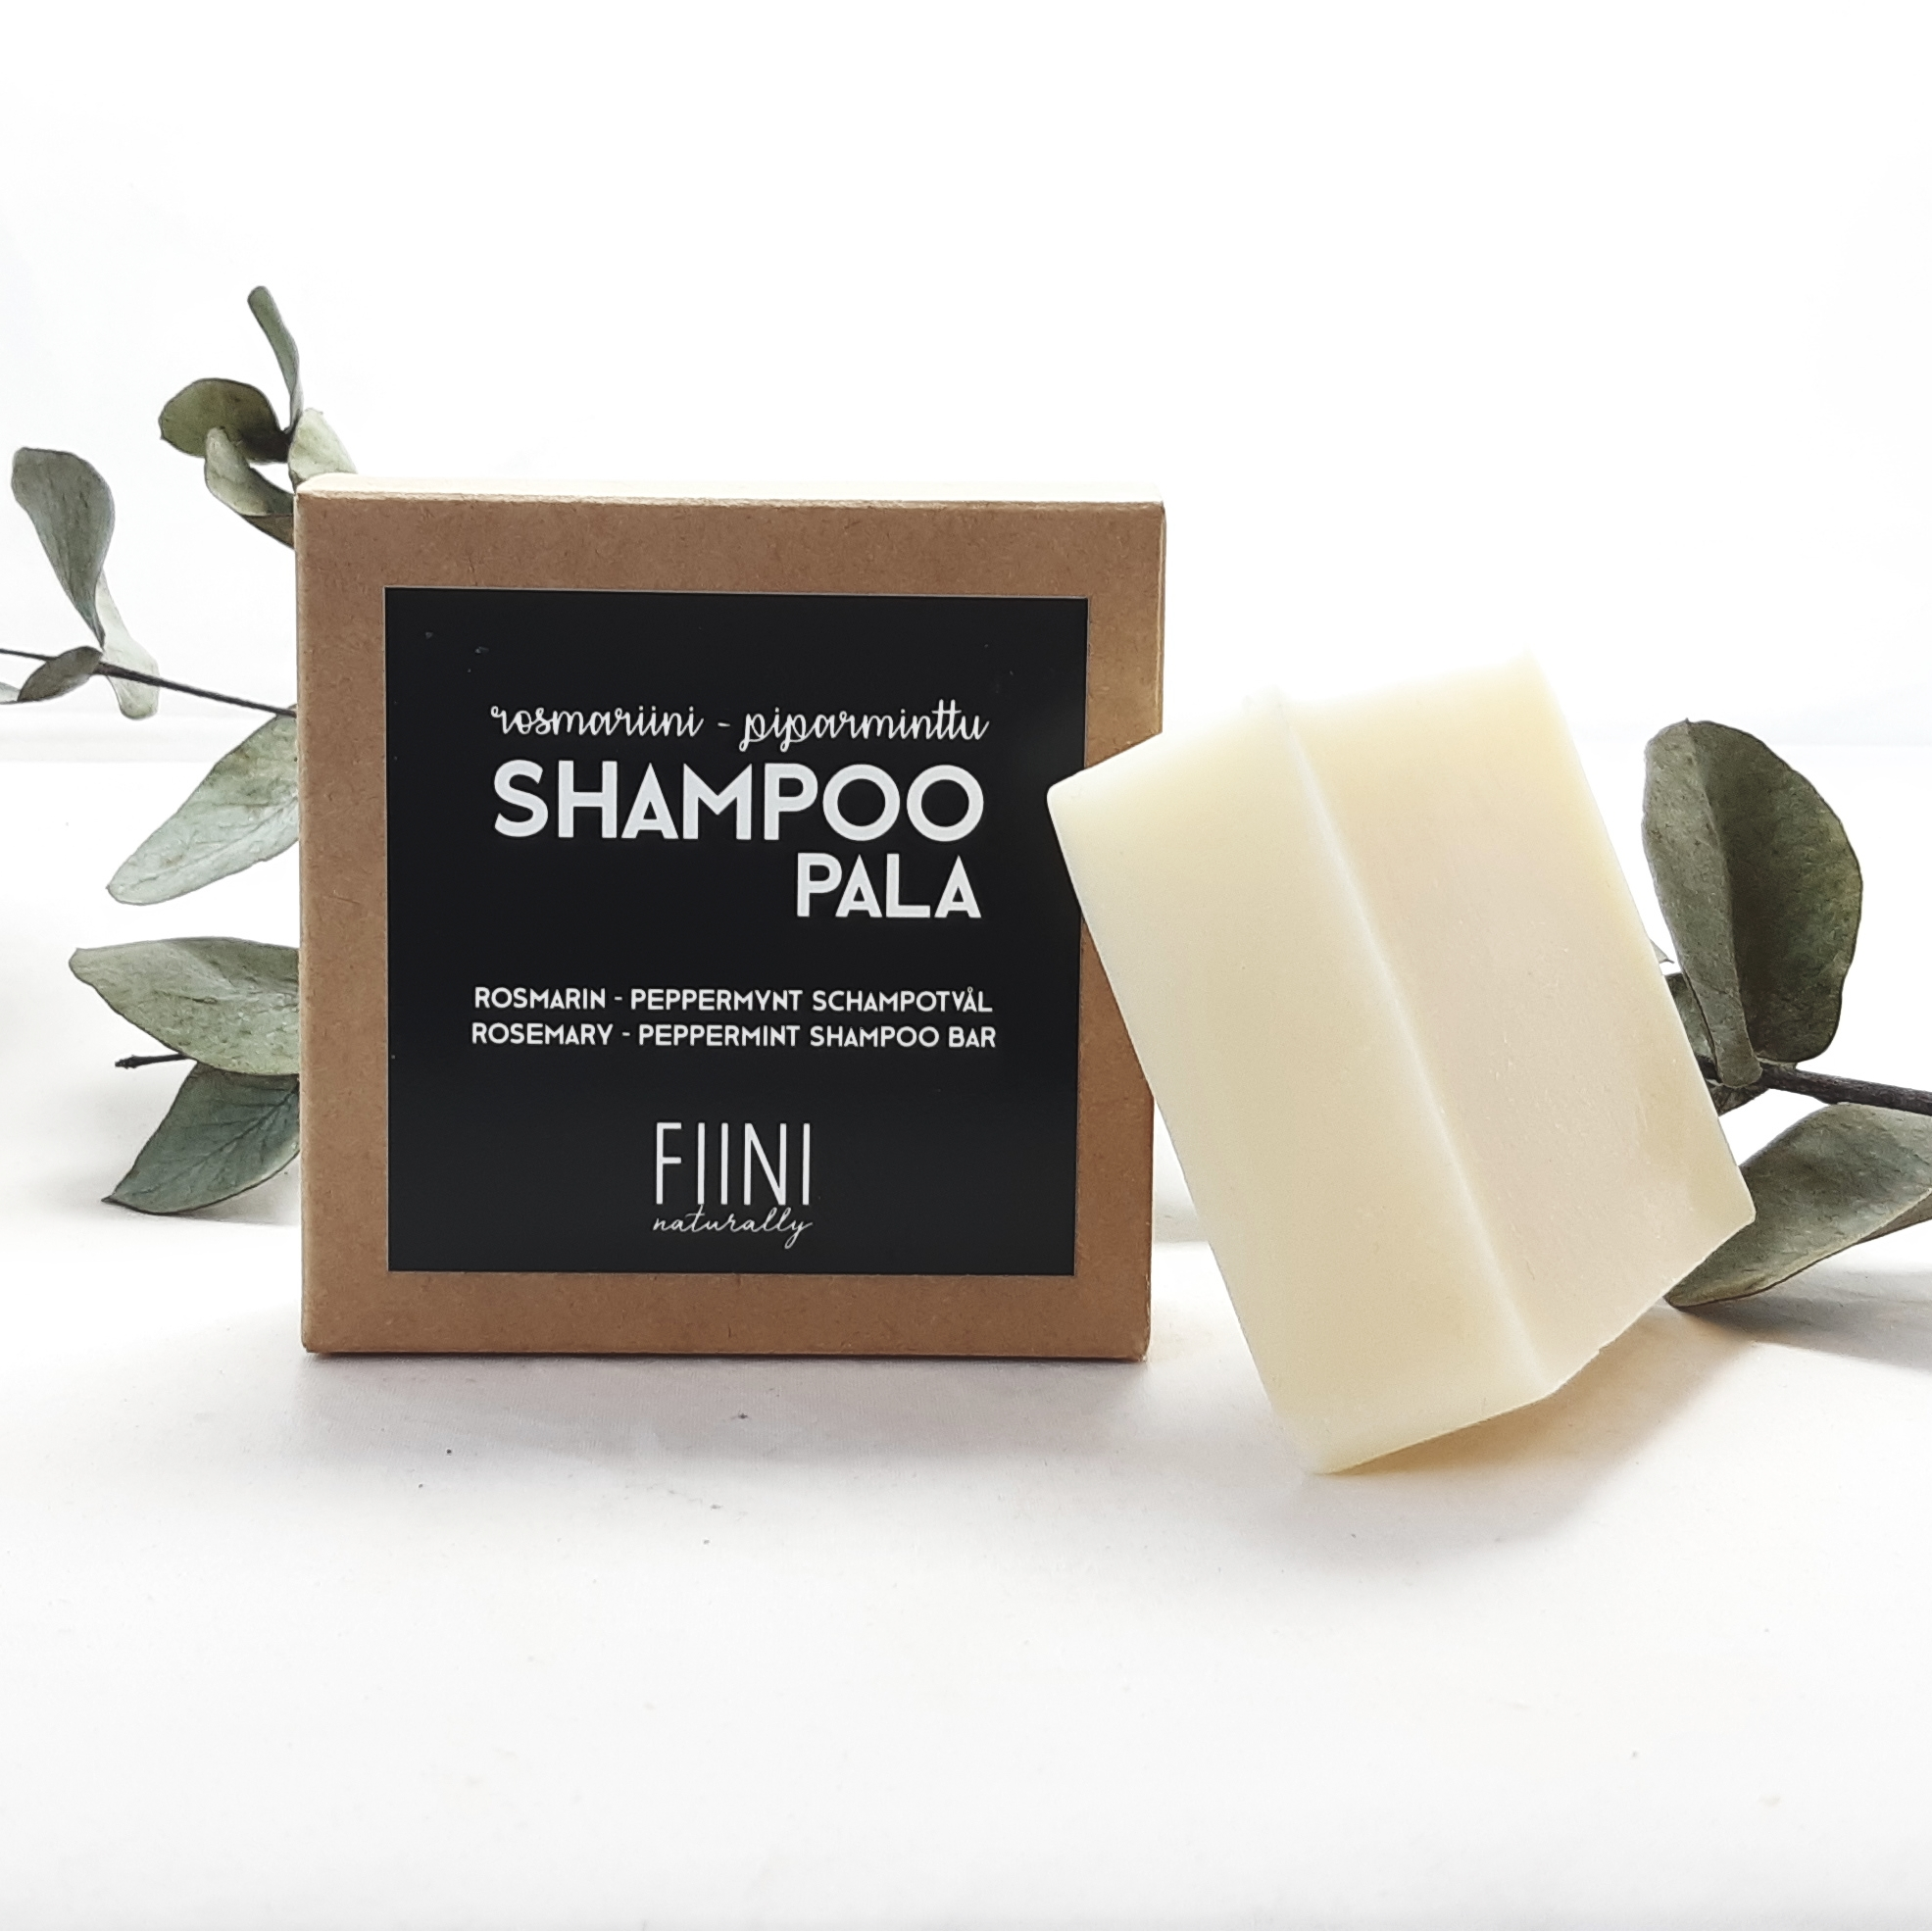 Fiini Naturally shampoopala rosmariini-piparminttu, 105g